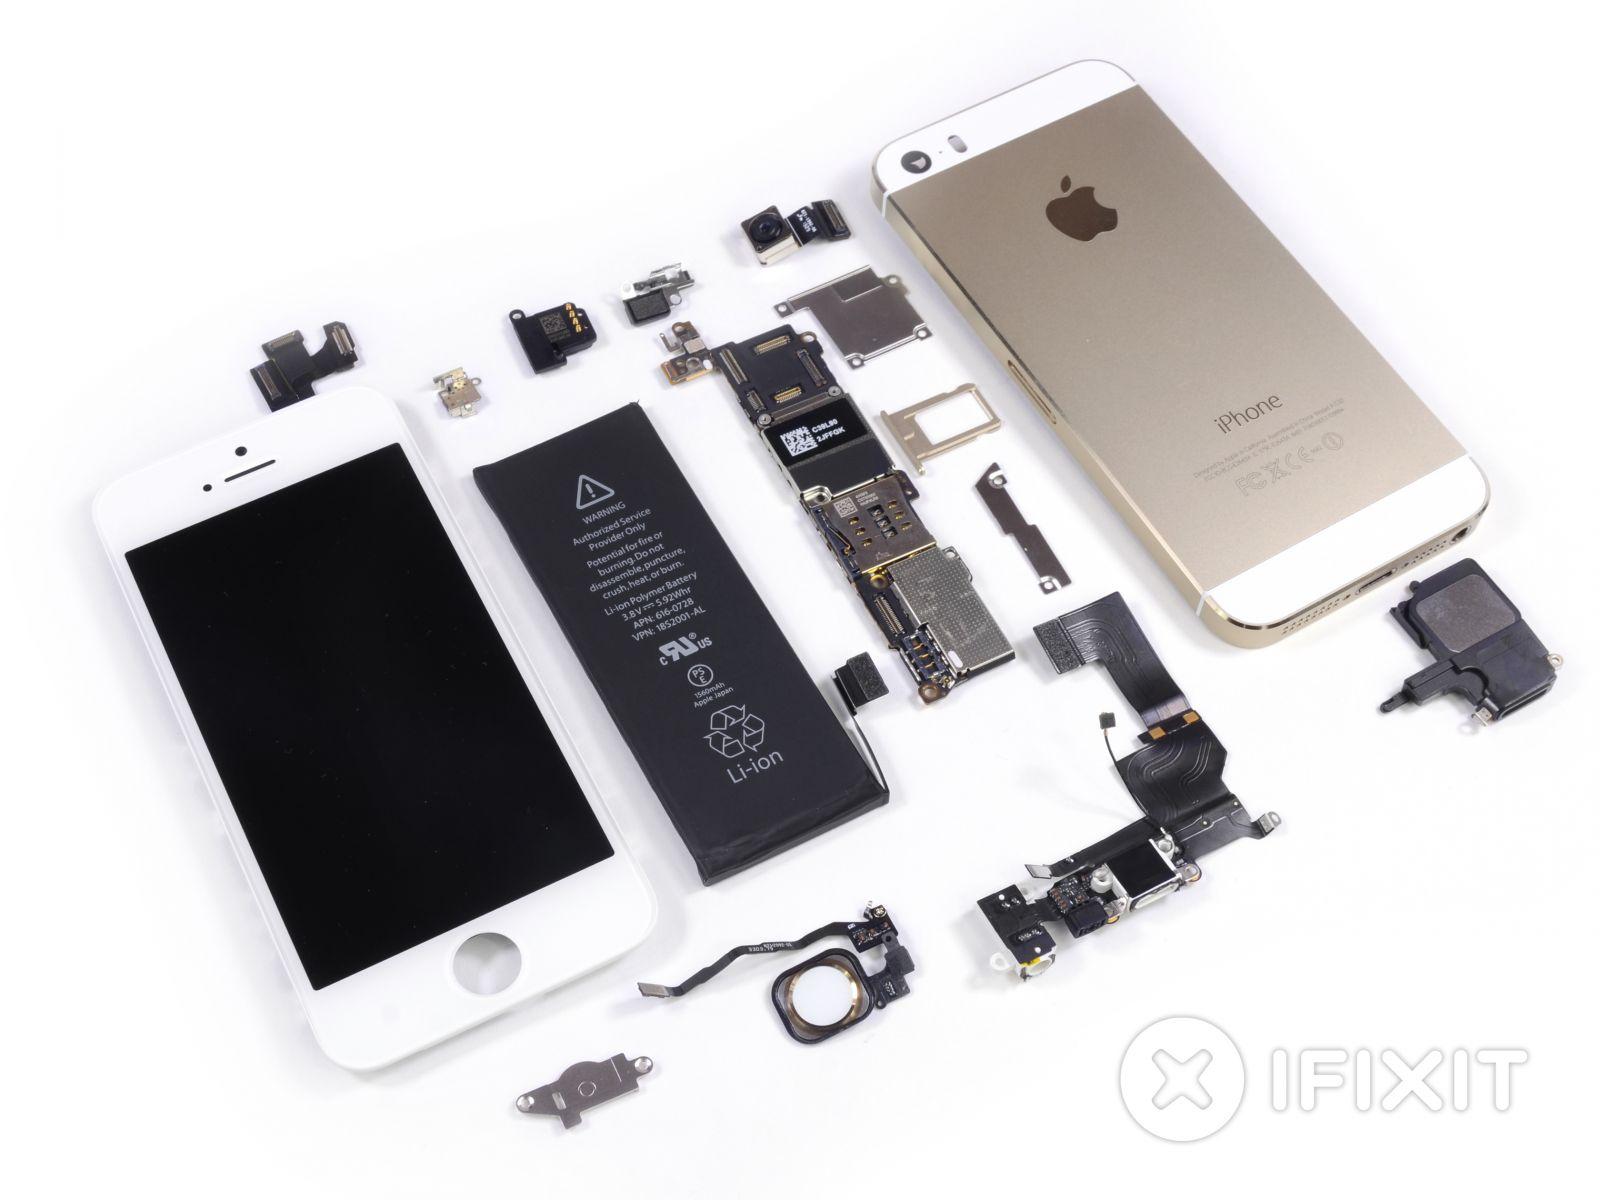 kak-razobrat-iphone-5s-46